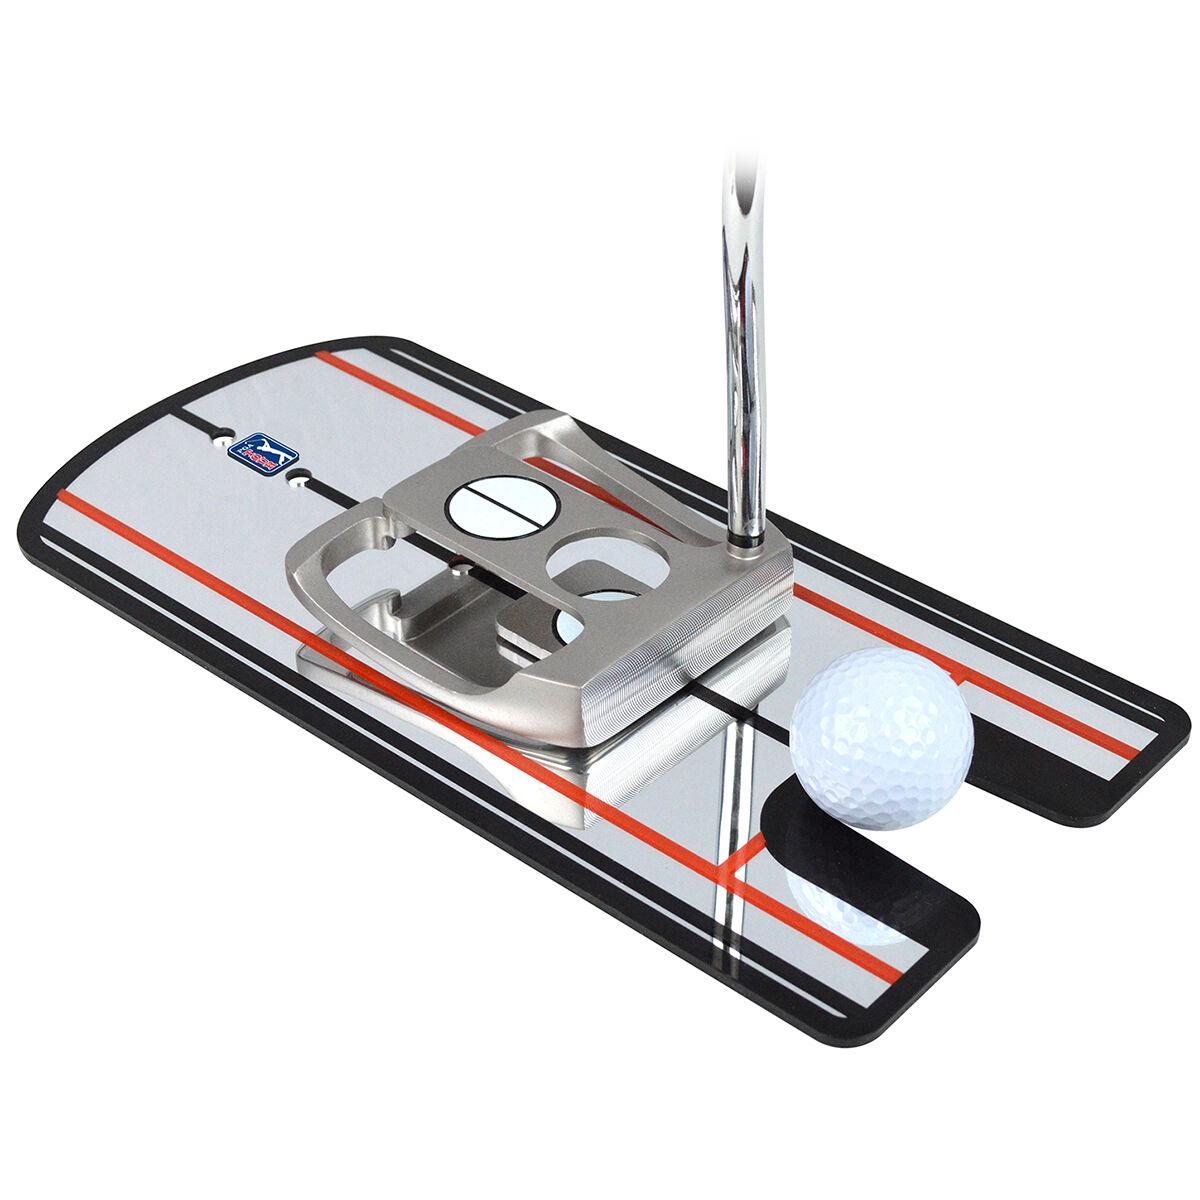 PGA Tour Silver and Black 4-Sight Pro Putting Alignment Golf Mirror, Size: 40x15.5x0.3cm | American Golf | American Golf